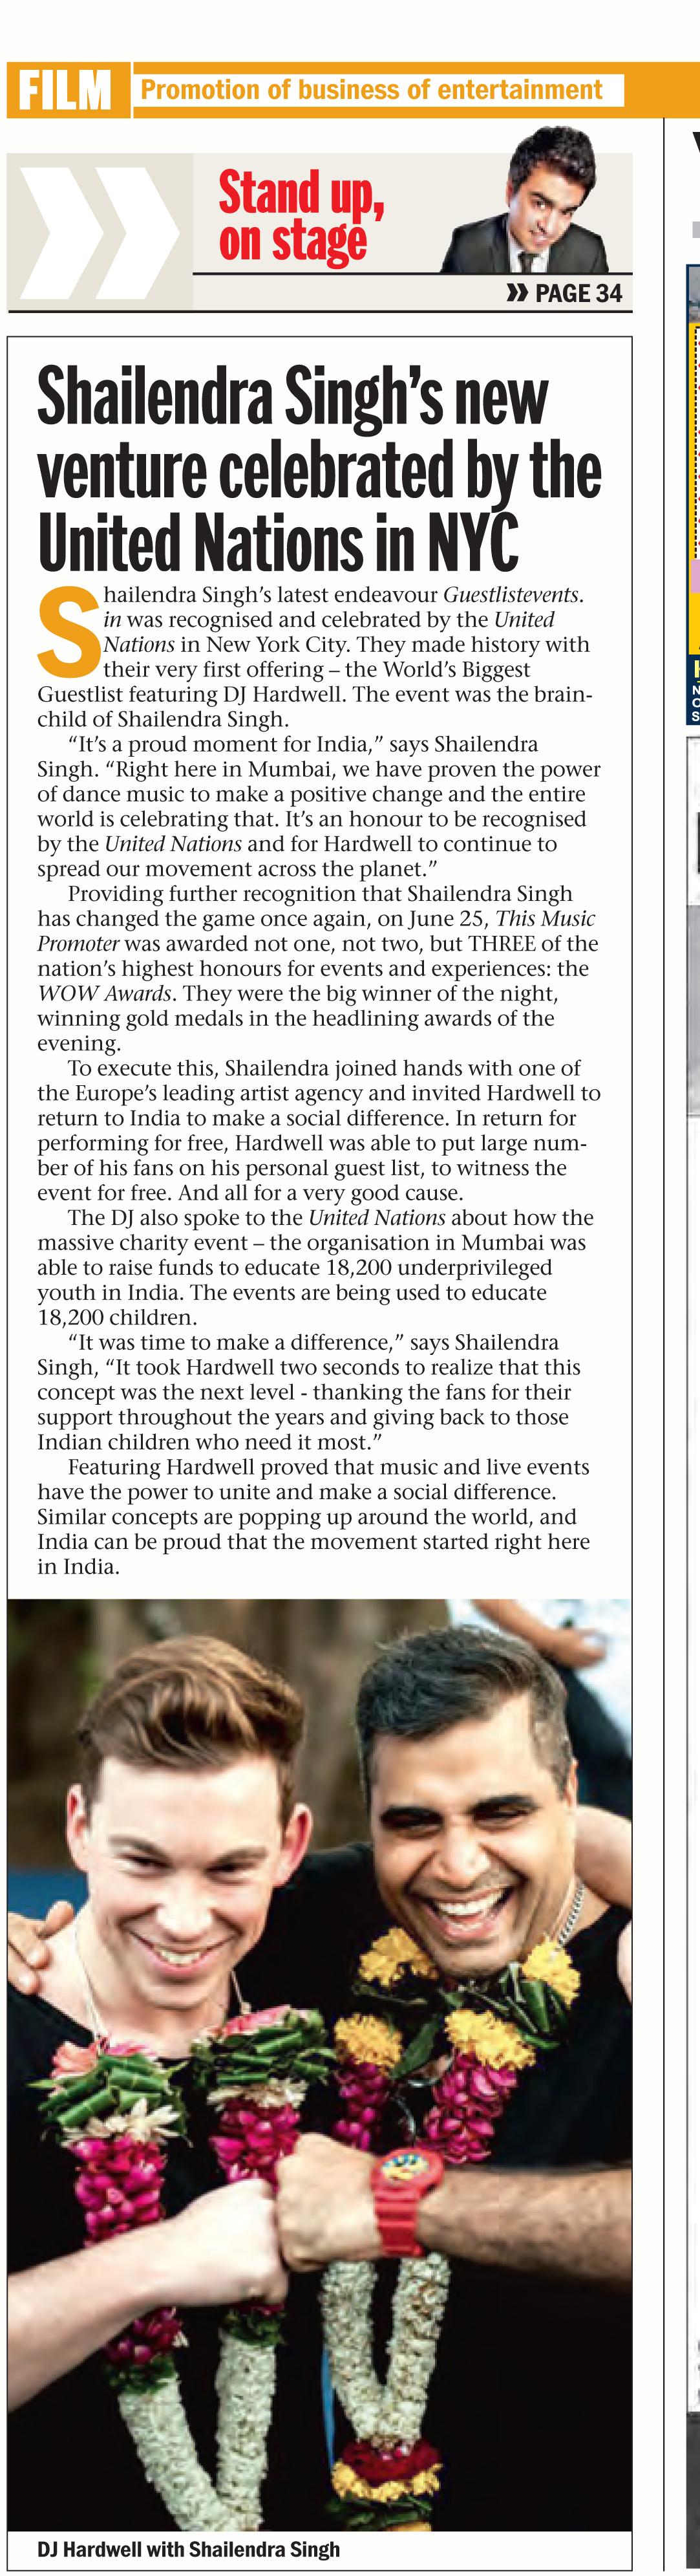 Mumbai Mirror. 11 July 2016